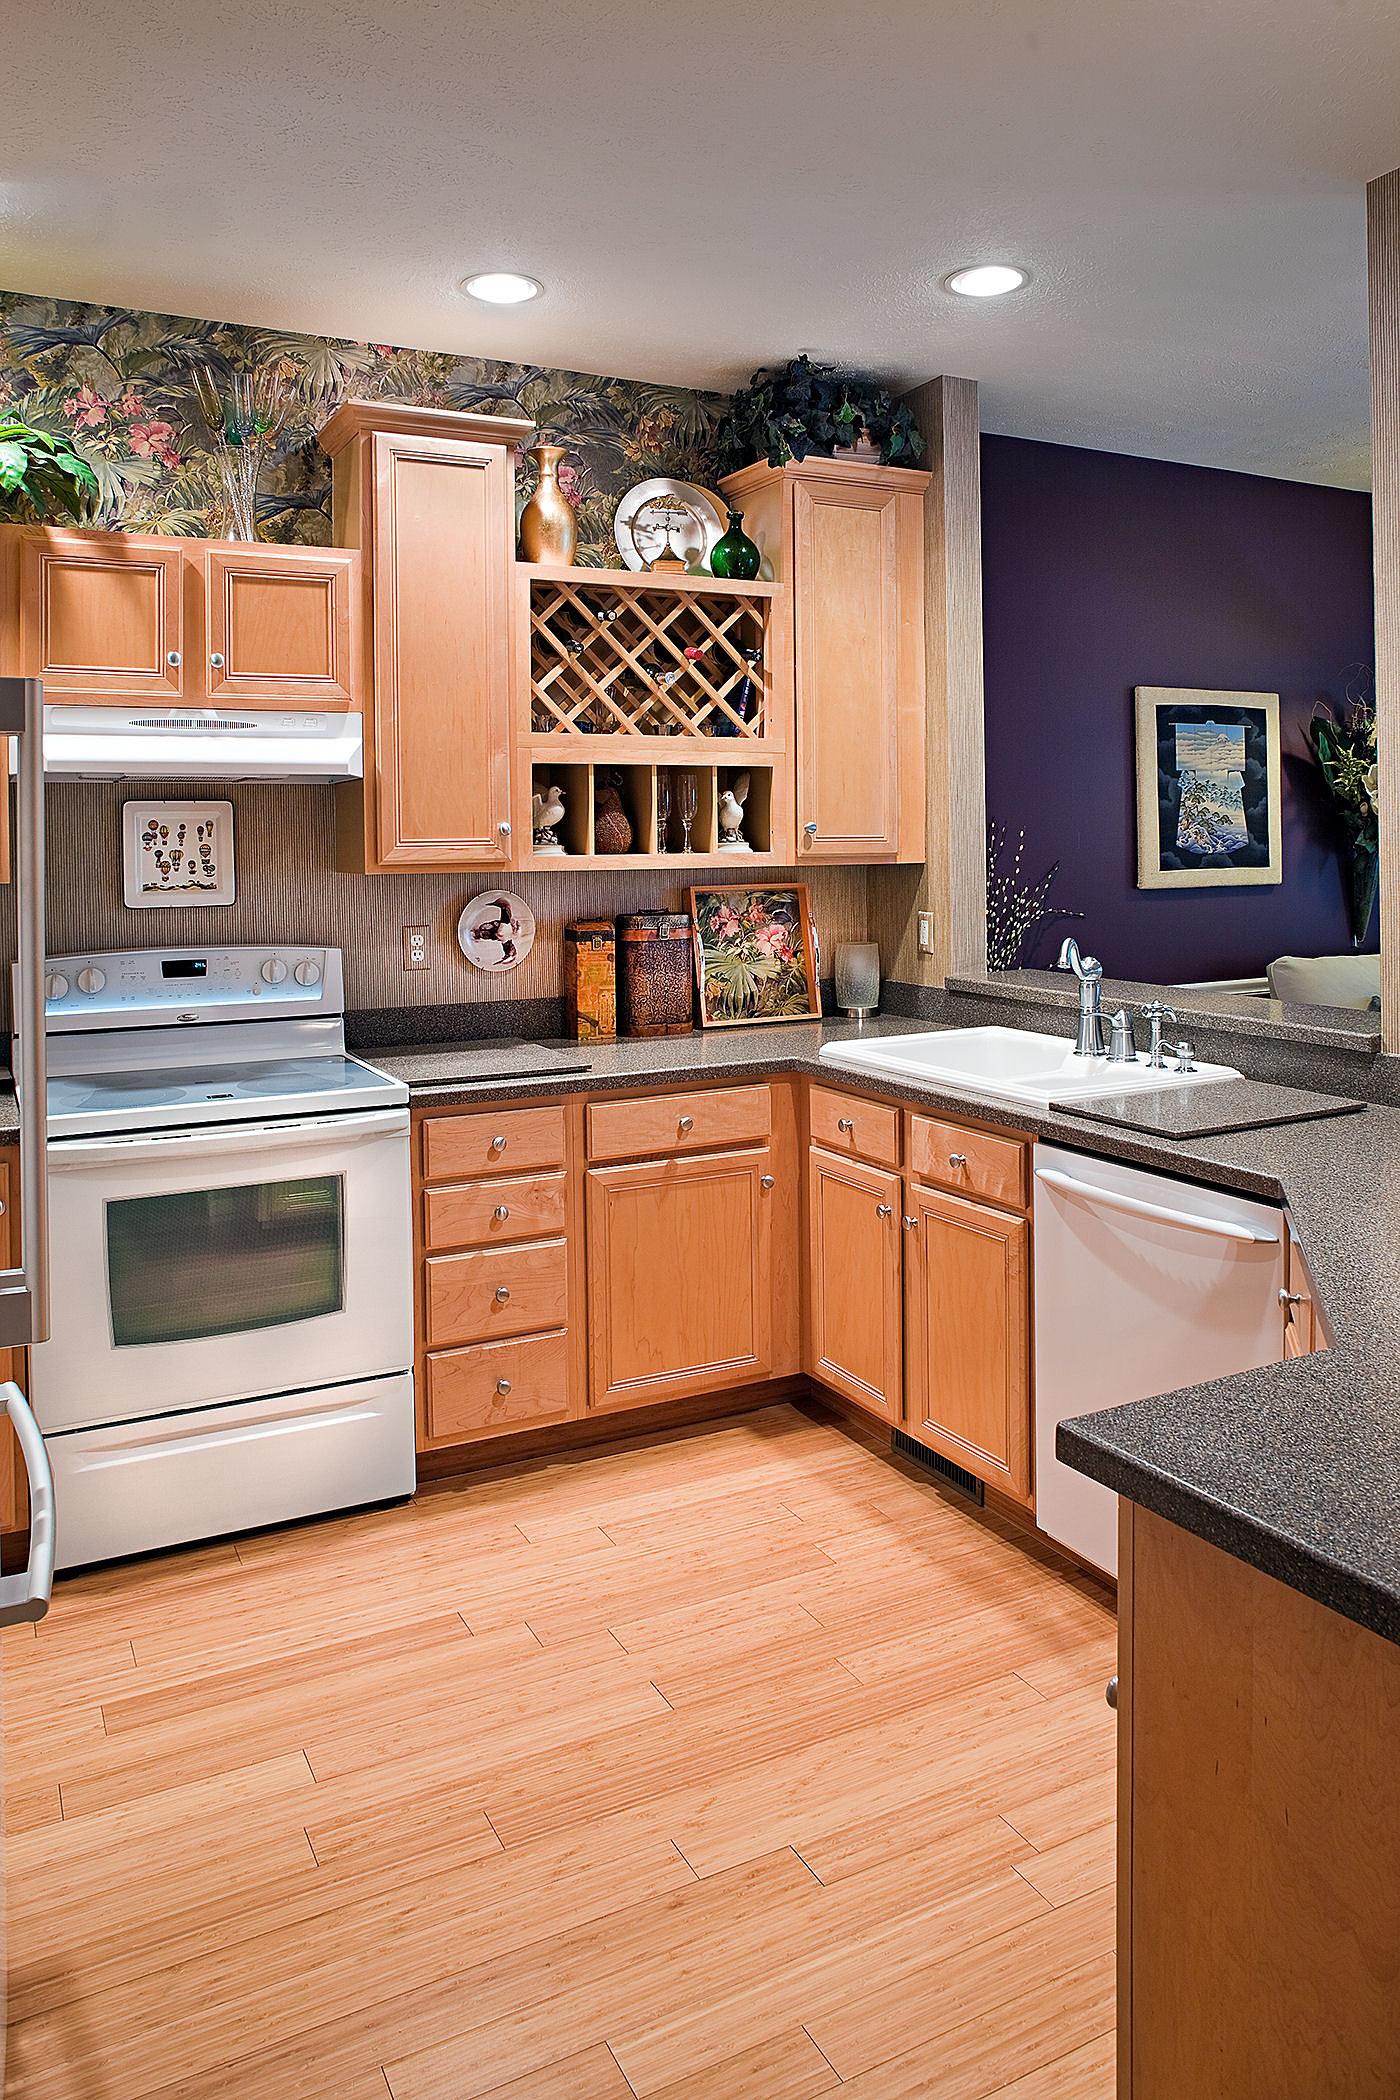 Kitchen Update Home Interiors By Deborah Beaman Llc Beaman Interiors Fresh